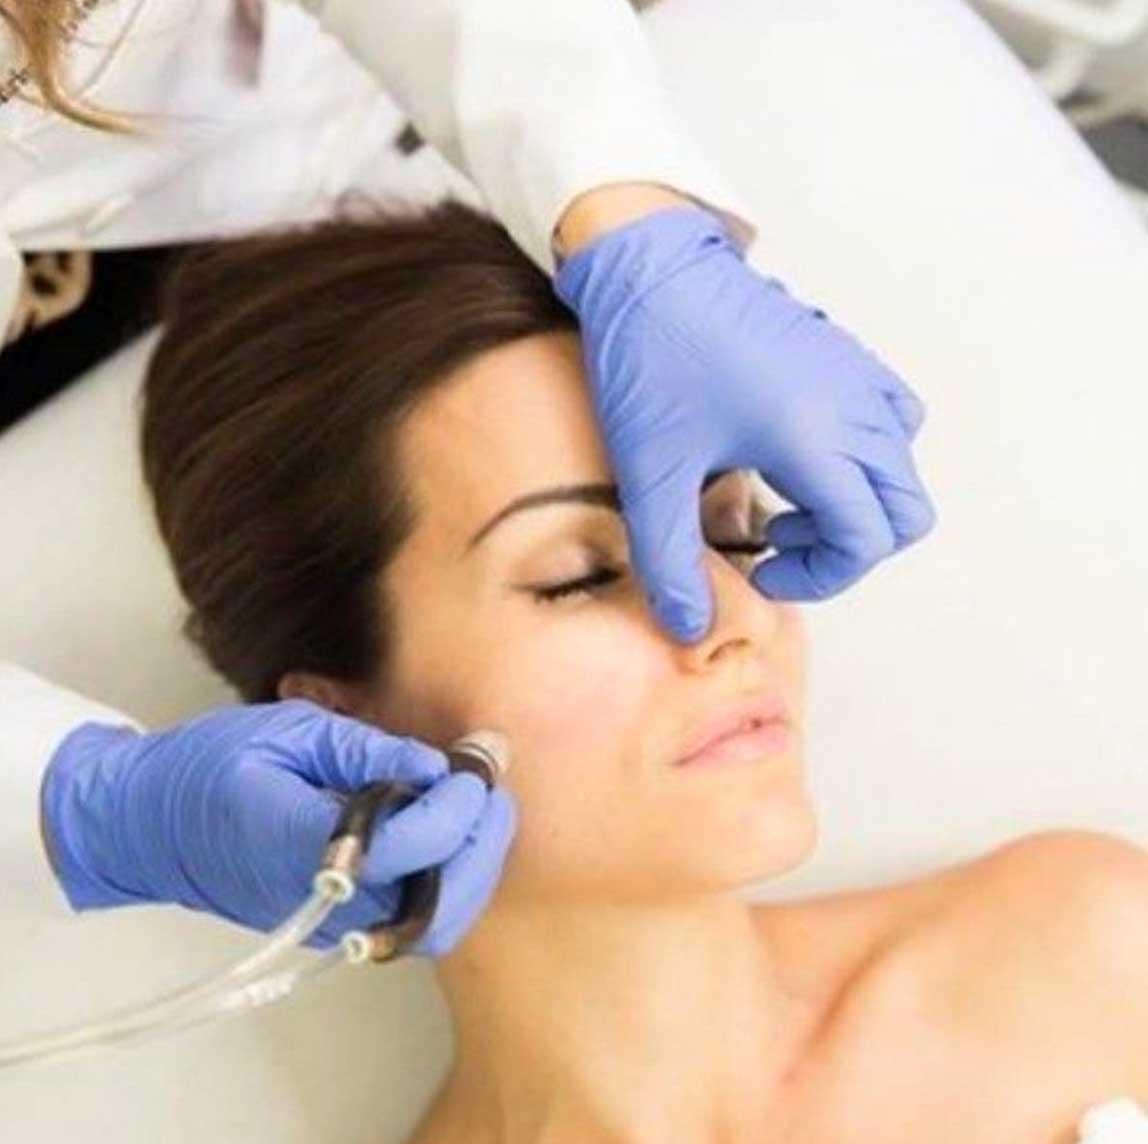 Diamond Glow Facial treatment in progess   Purely You Spa Diamond Glow Facial Spa Membership